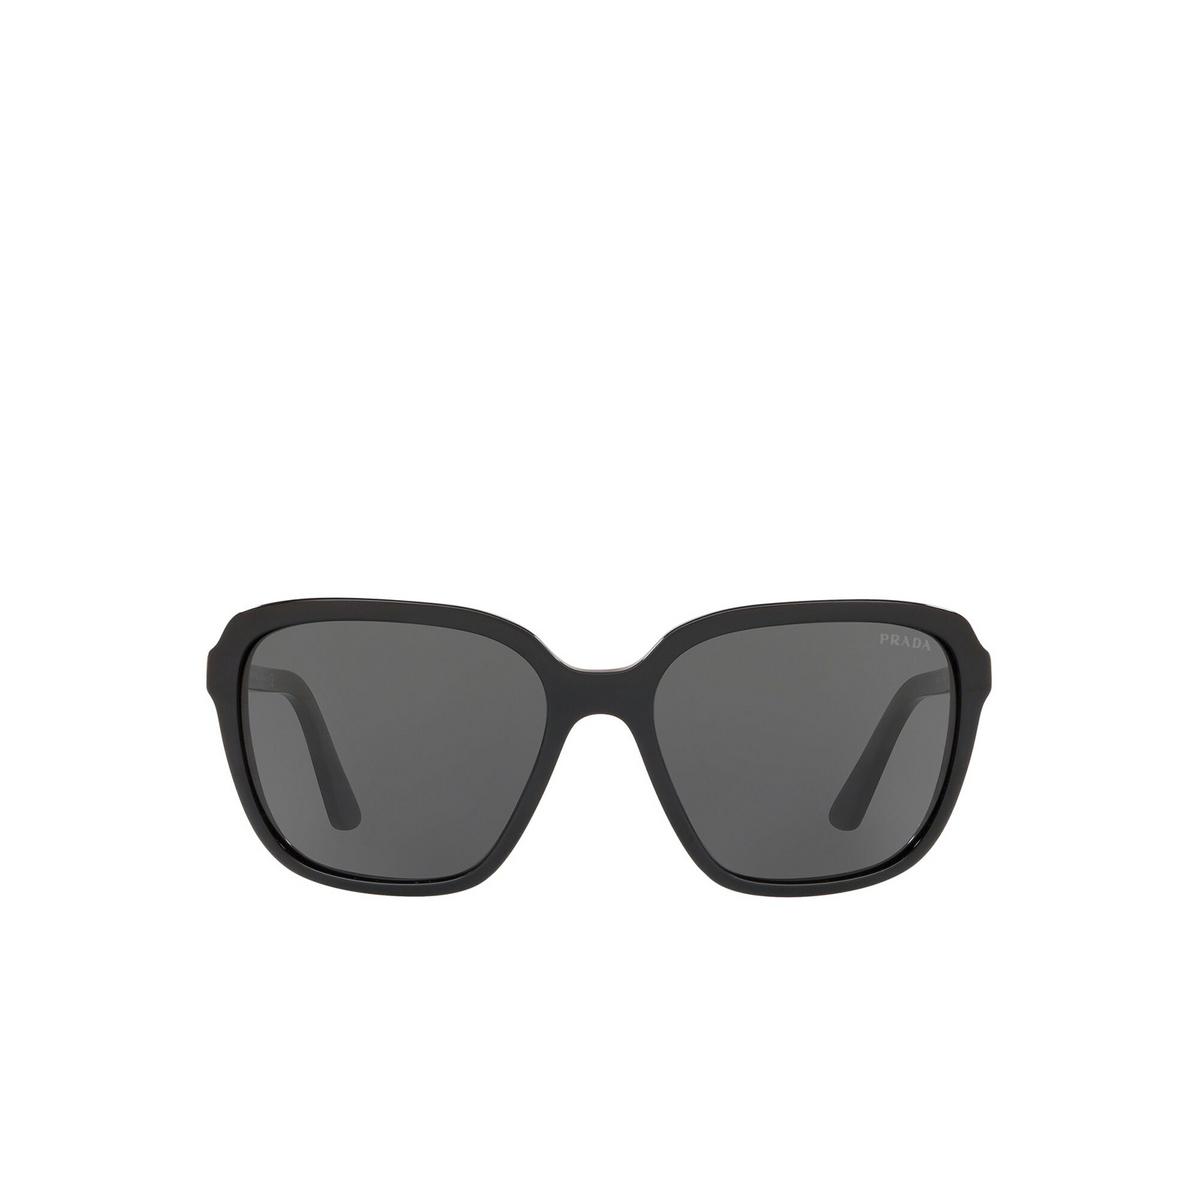 Prada® Square Sunglasses: Heritage PR 10VS color Dark 1AB5S0 - front view.